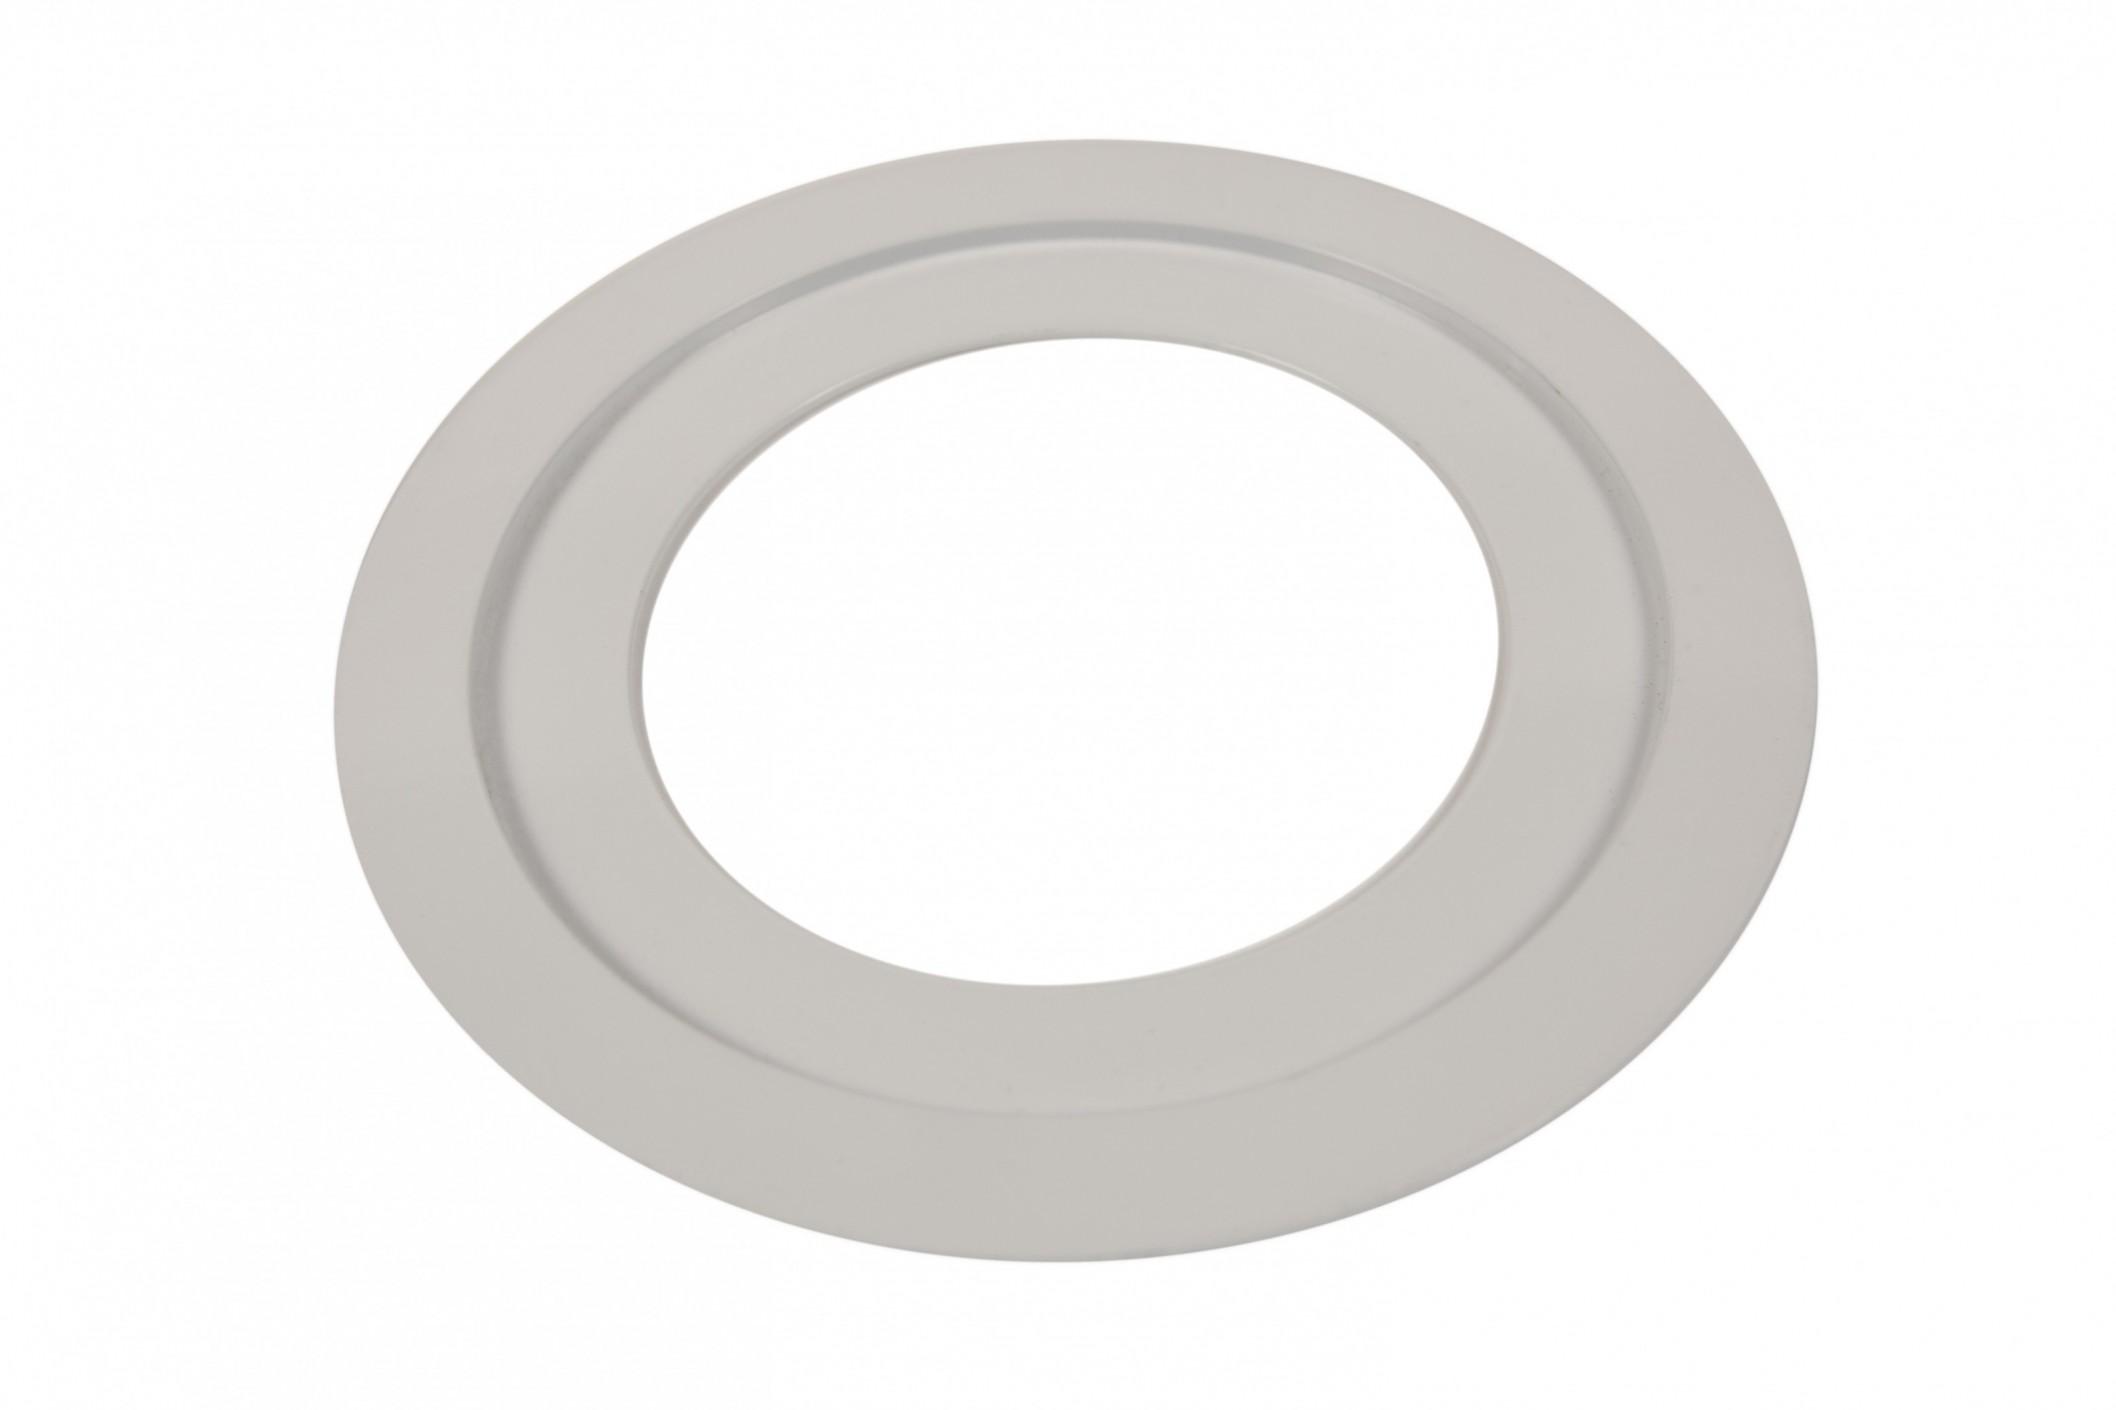 retrofit adapter ring for recessed lights rim rf rimikon. Black Bedroom Furniture Sets. Home Design Ideas